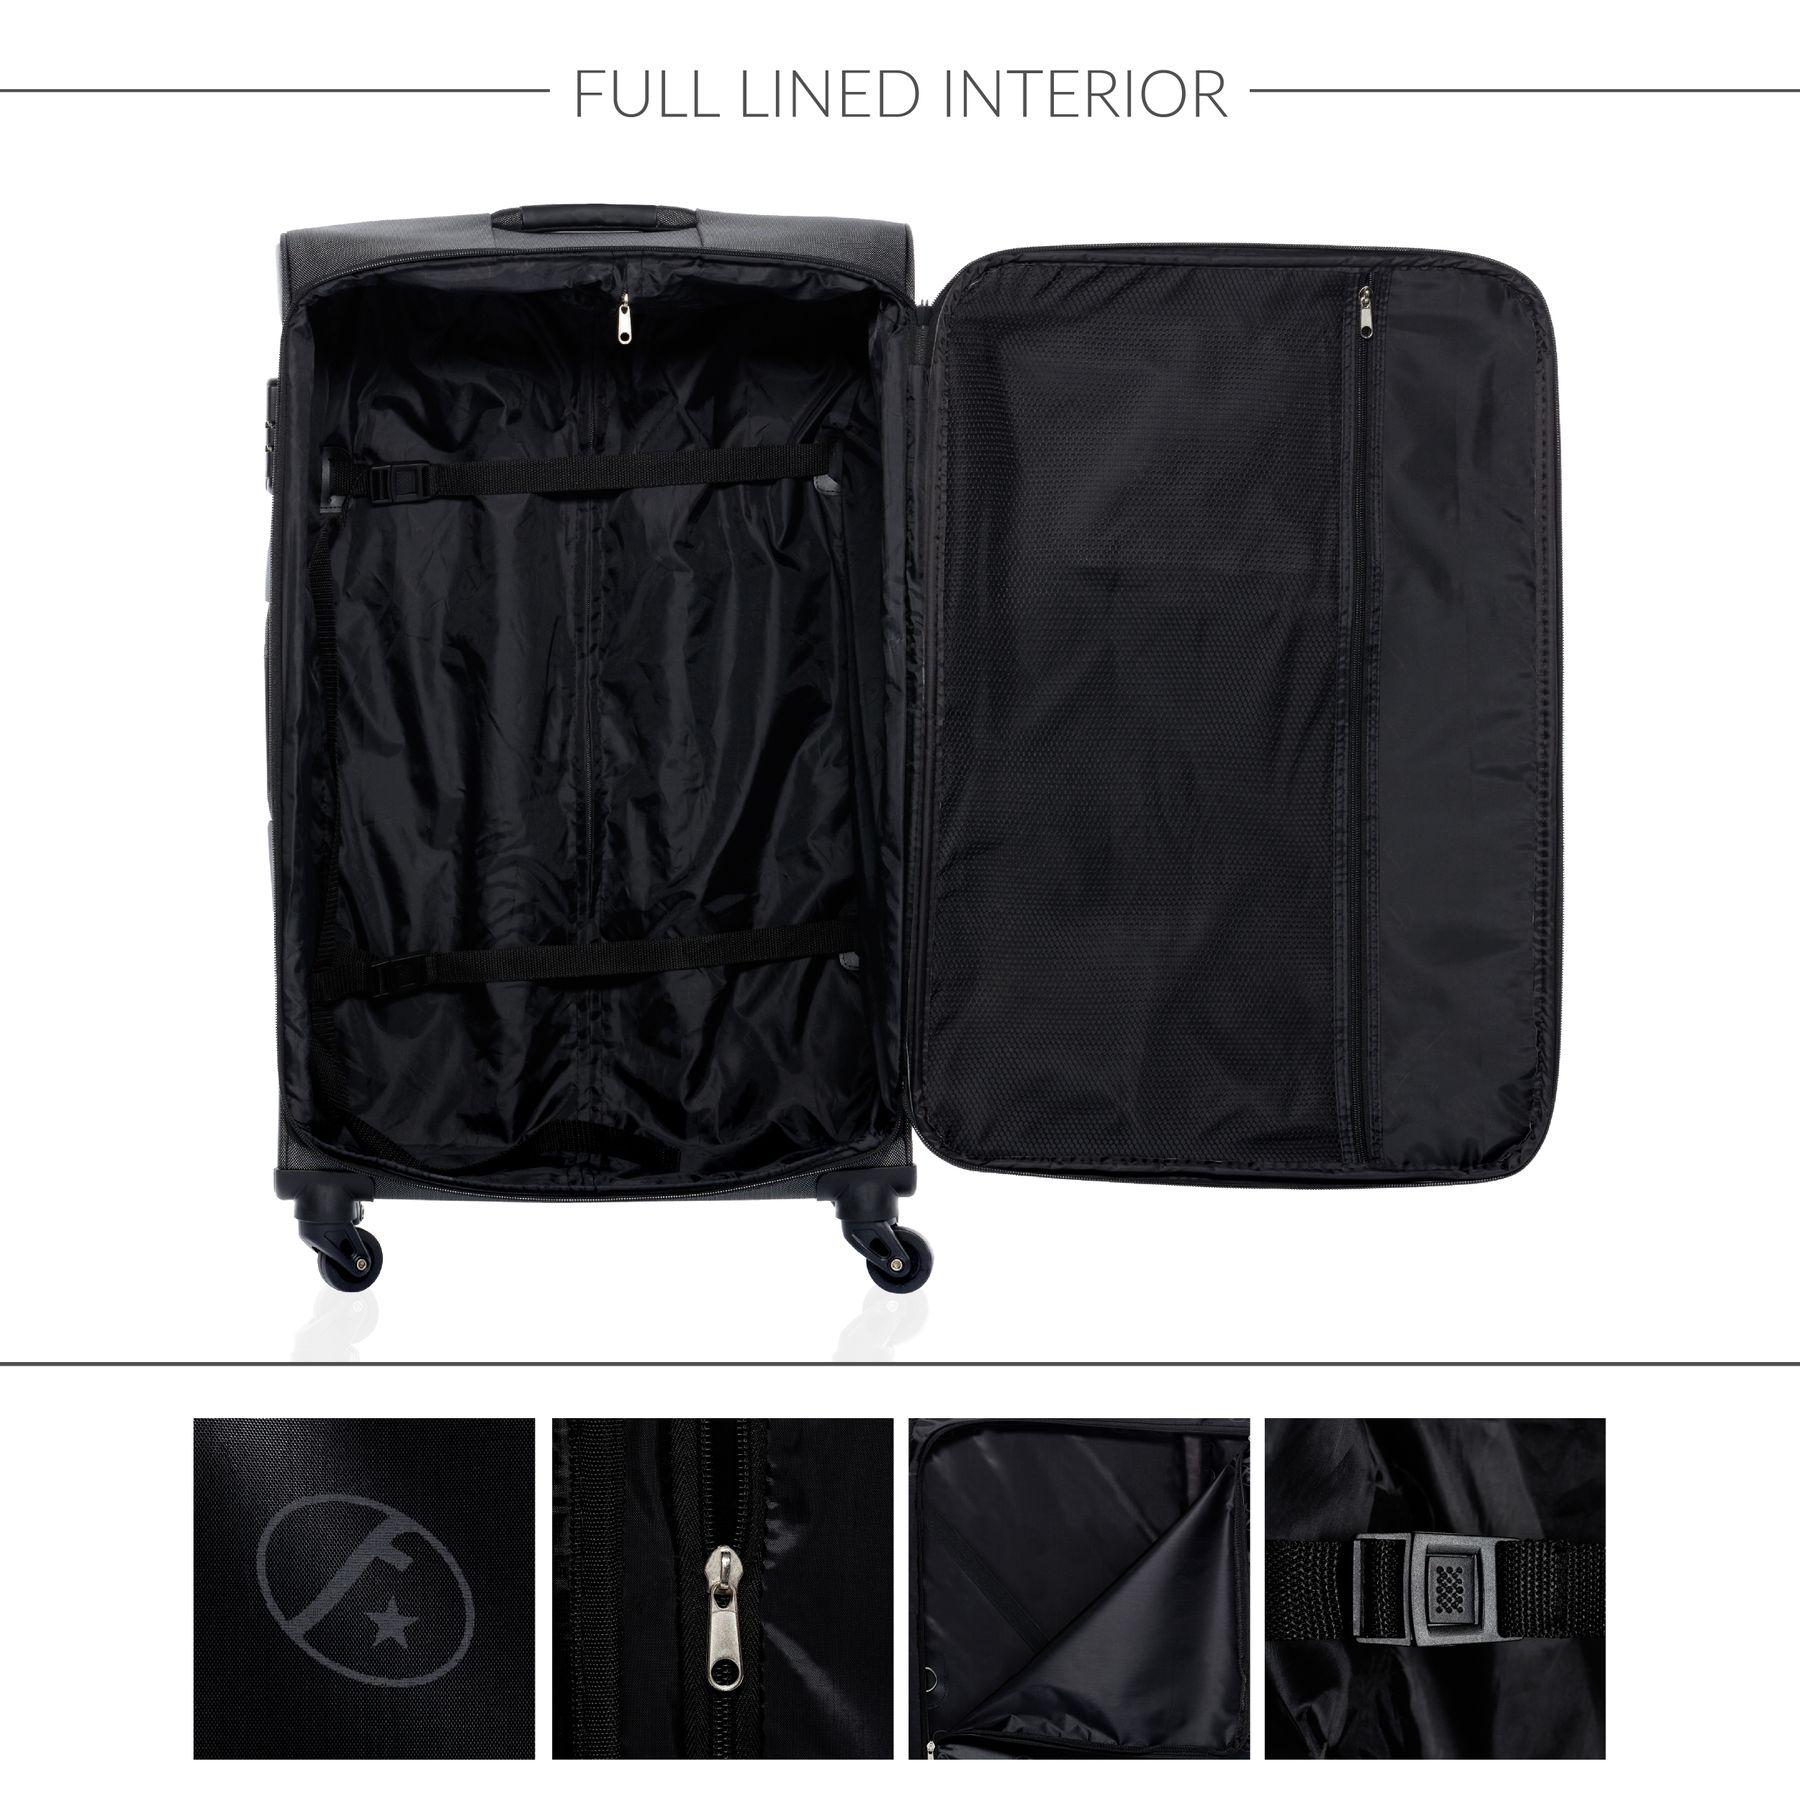 6587beed7 FERGÉ luggage set 3 piece Nylon LYON black soft shell travel trolley ...